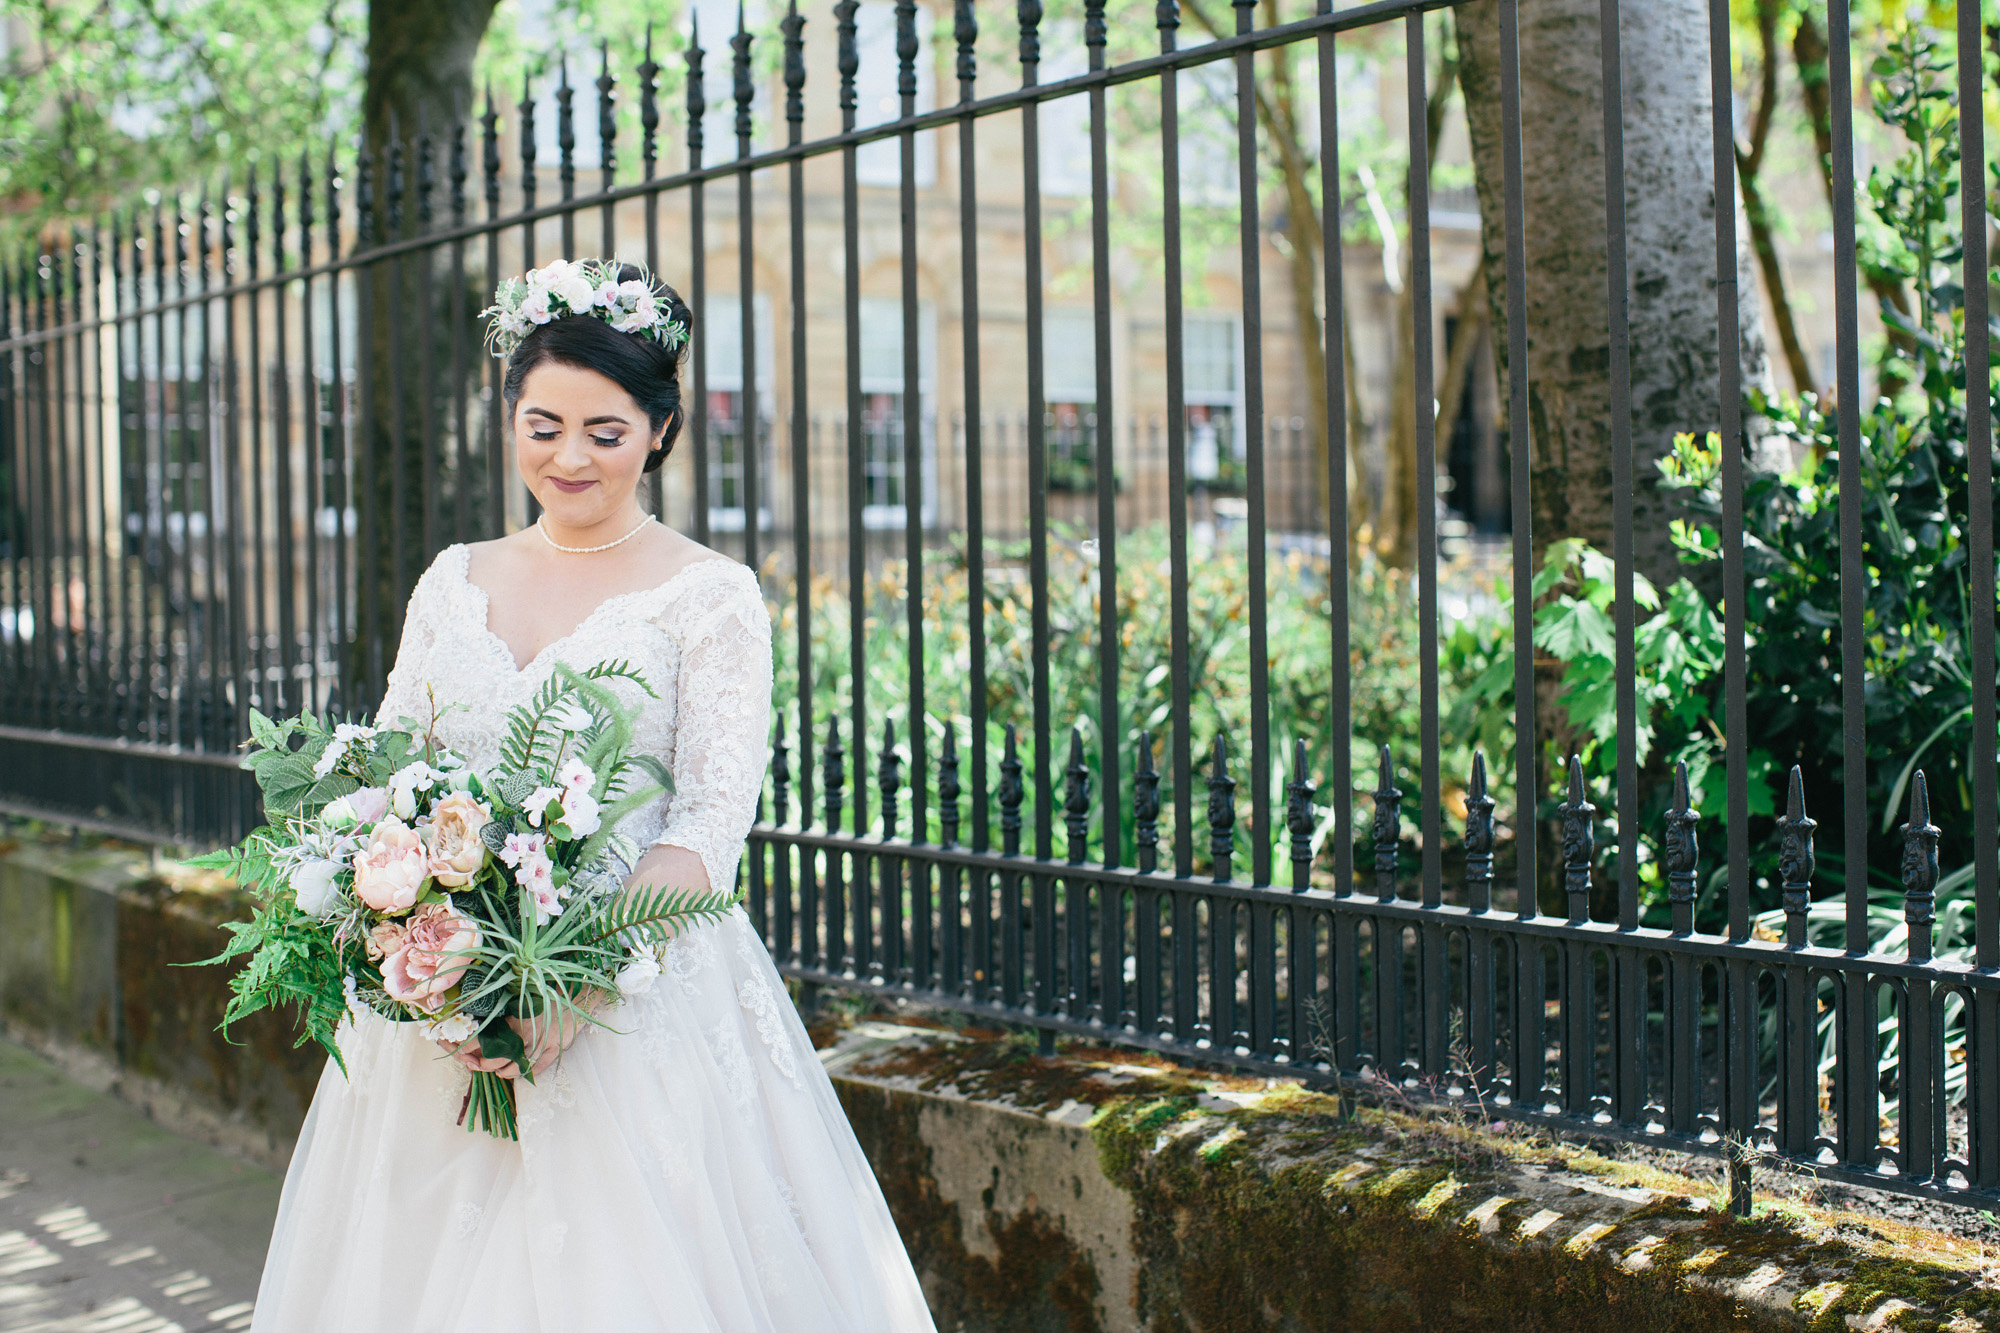 Quirky Wedding Photography Glasgow West End 013.jpg